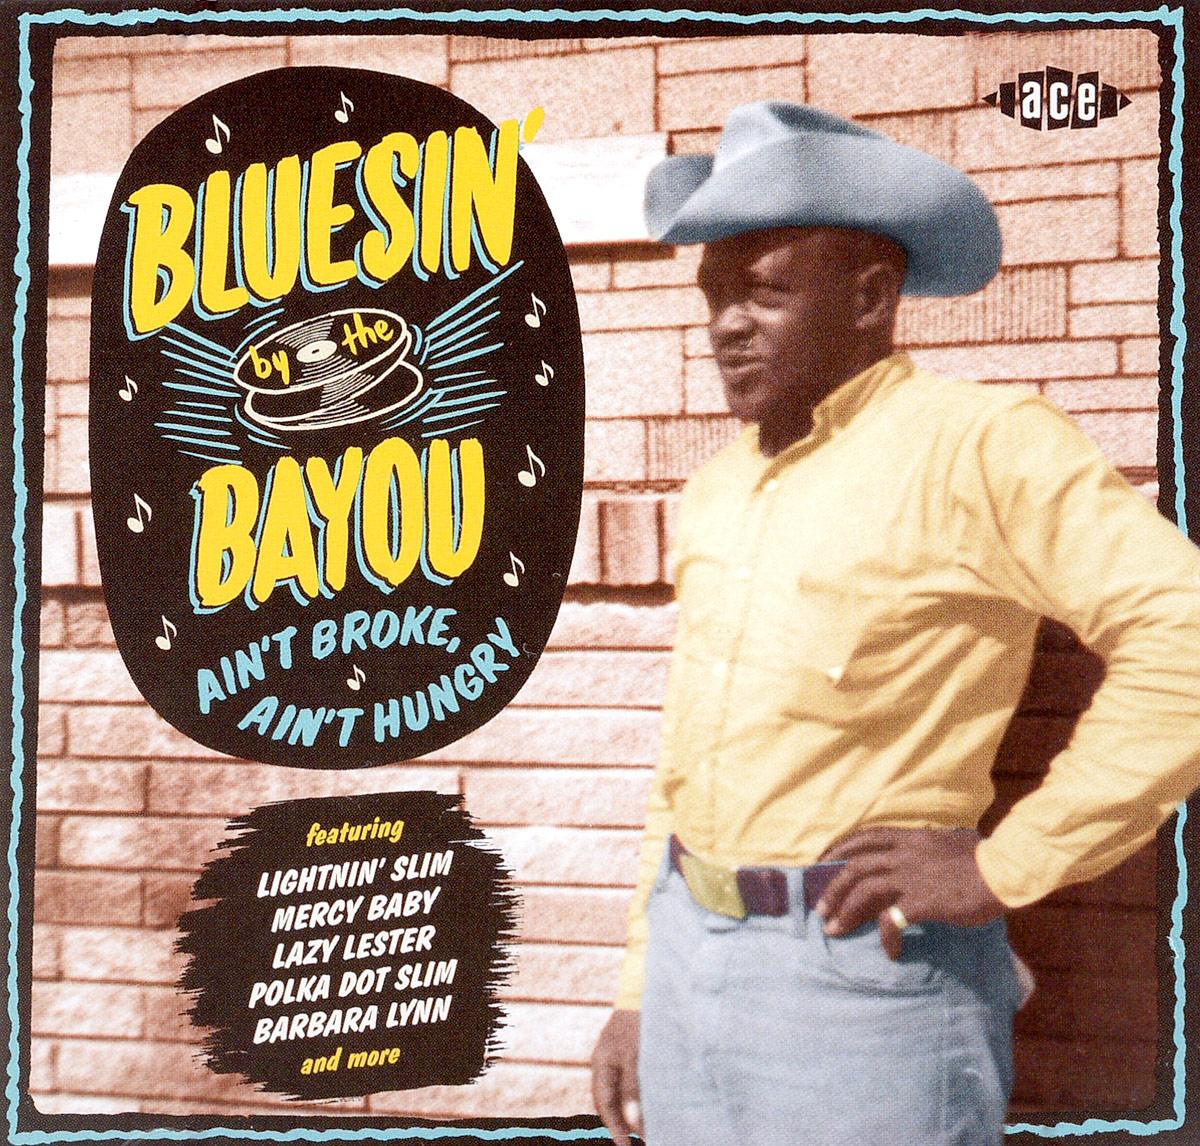 Bluesin' By The Bayou - Ain't Broke, Ain't Hungry tindersticks tindersticks the hungry saw